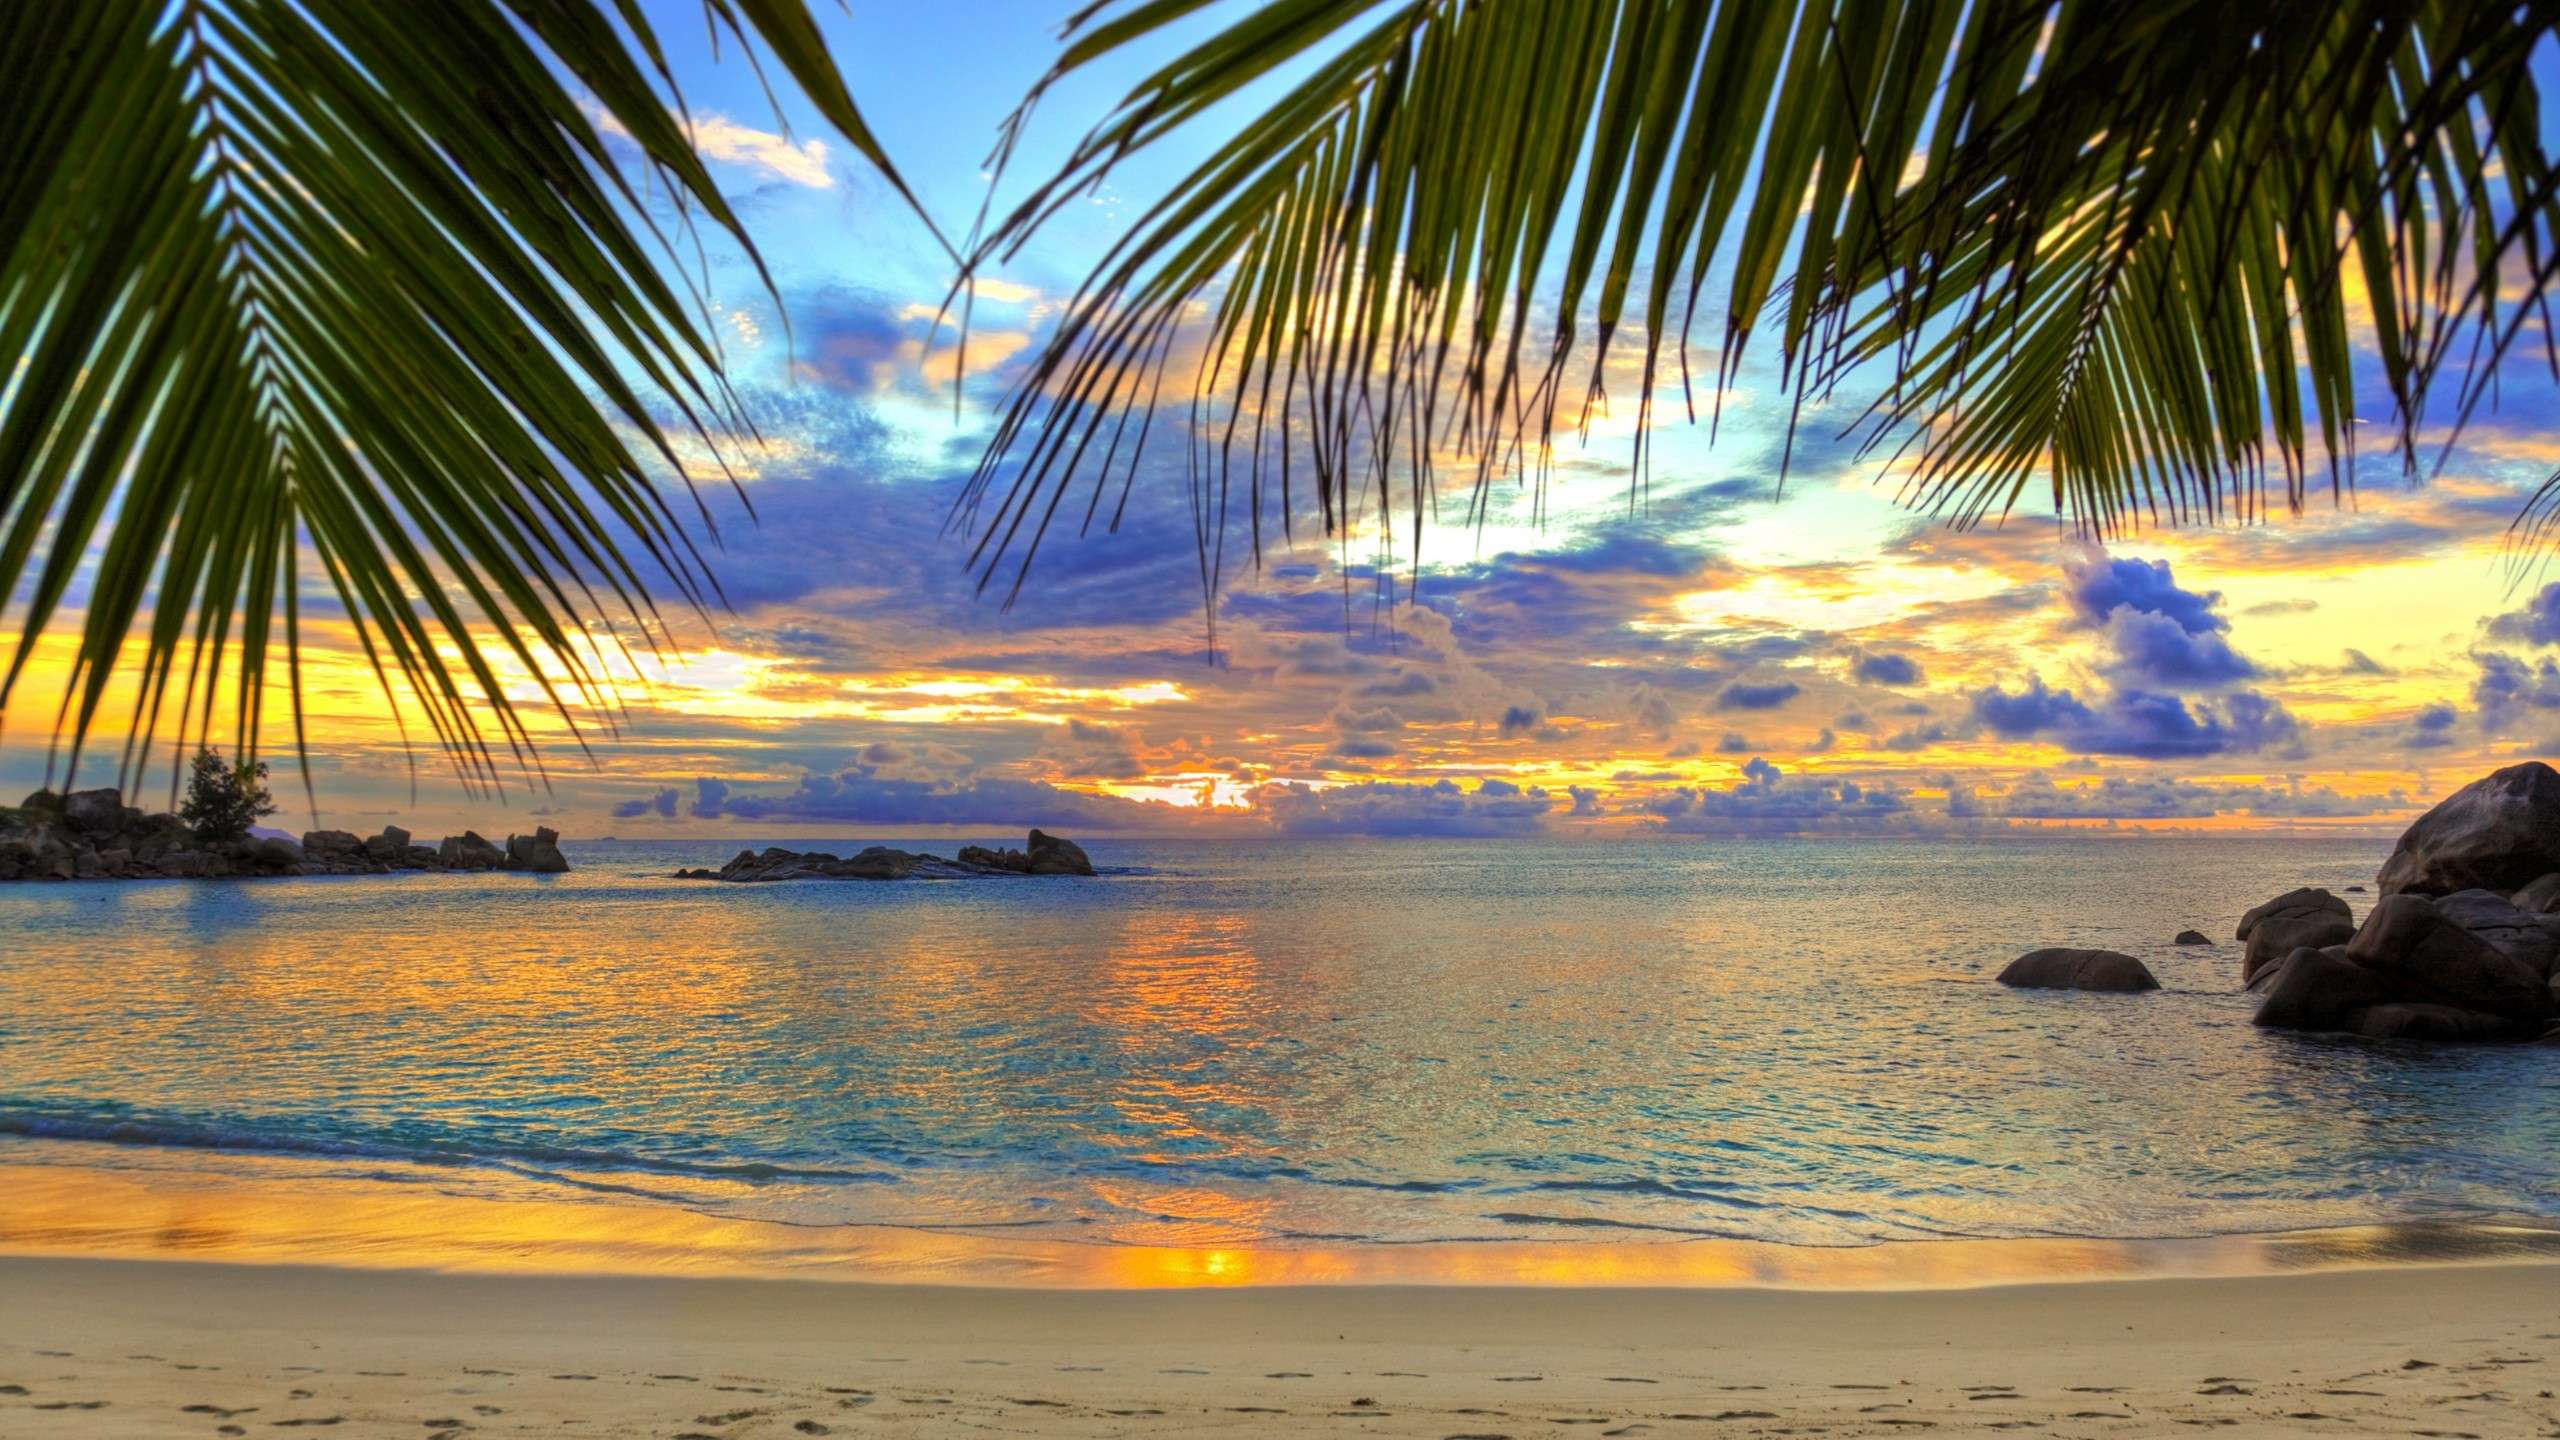 Preview wallpaper beach, tropics, sea, sand, palm trees 2560×1440